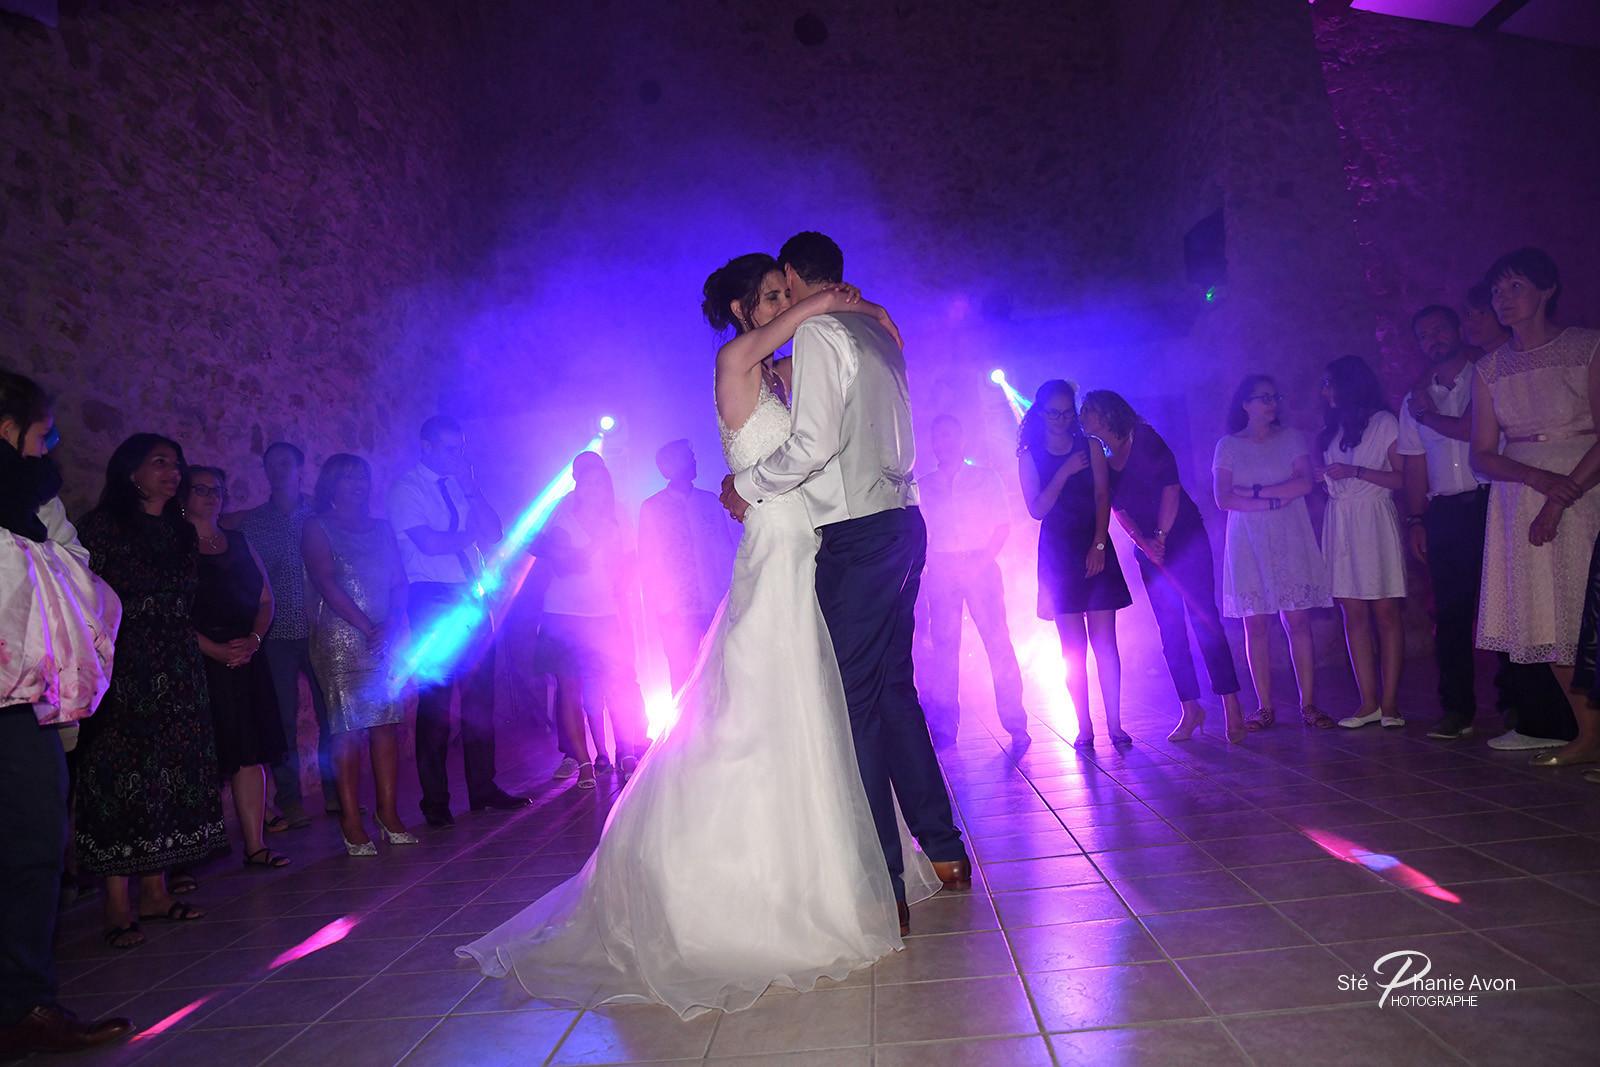 photographe-de-mariage-13.JPG